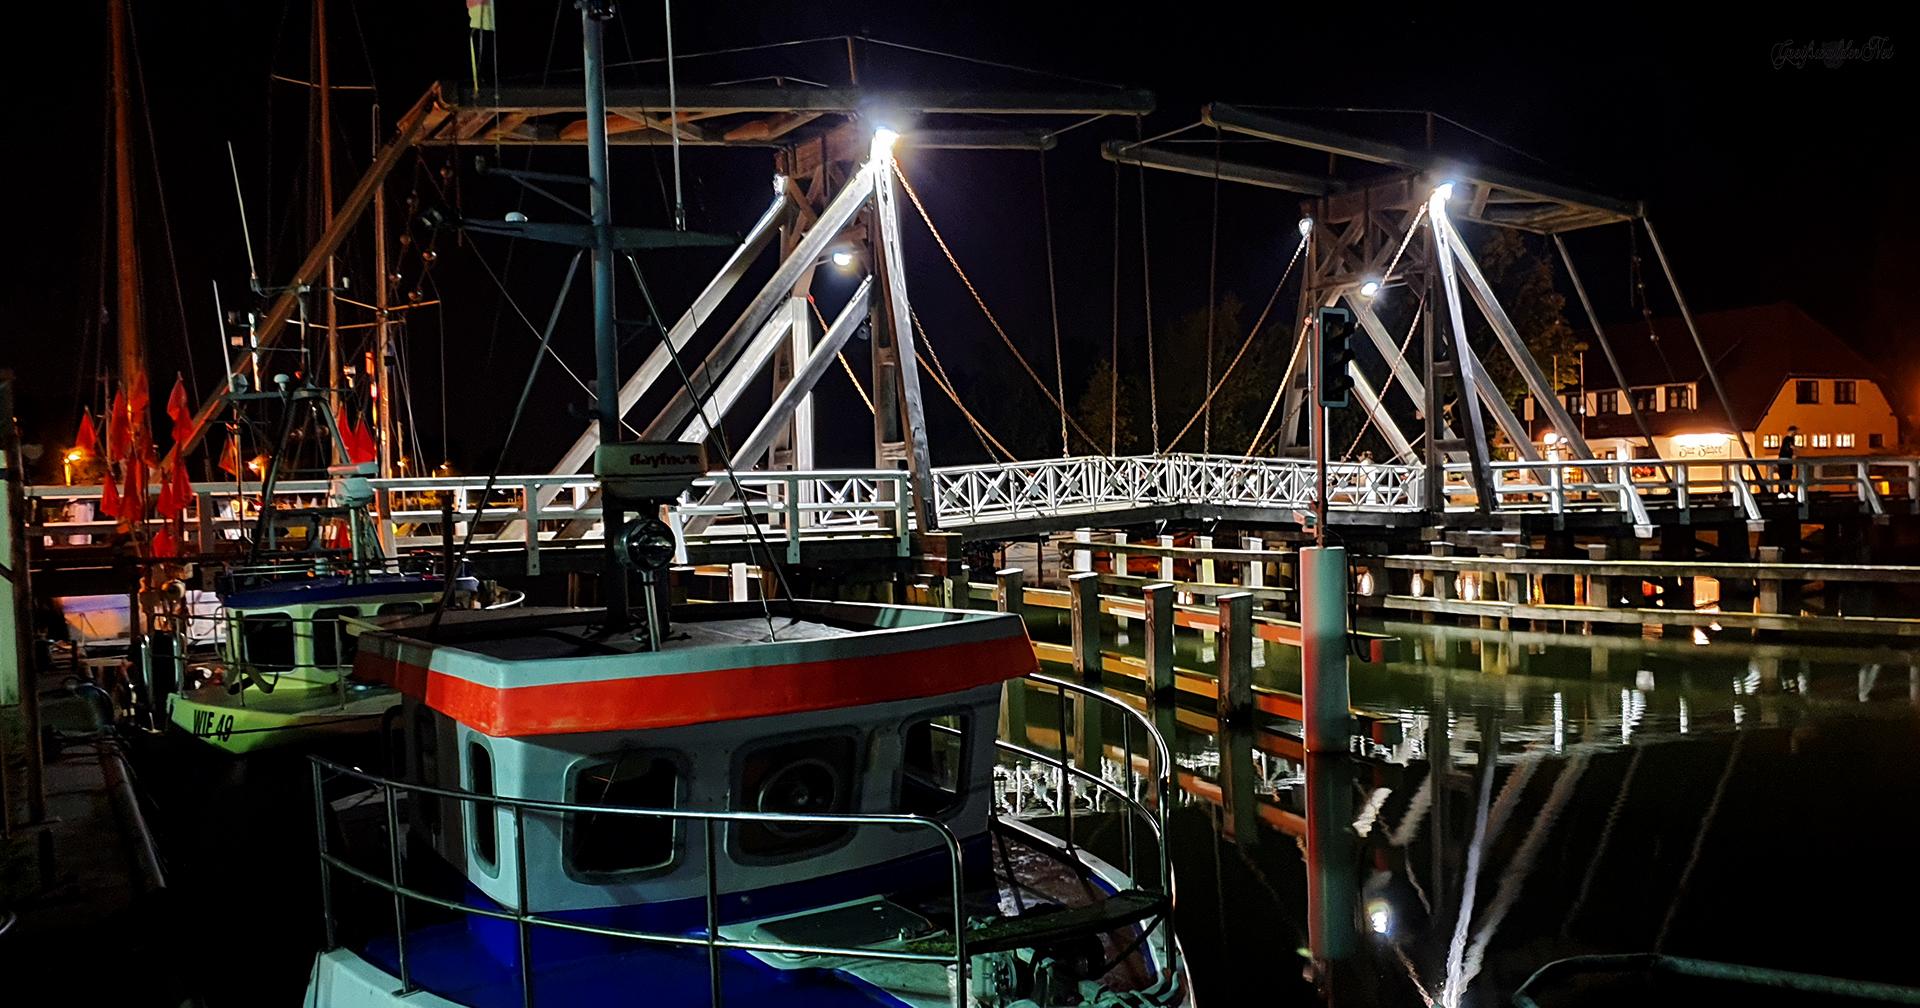 Holzklappbrücke in Greifswald-Wieck bei Nacht